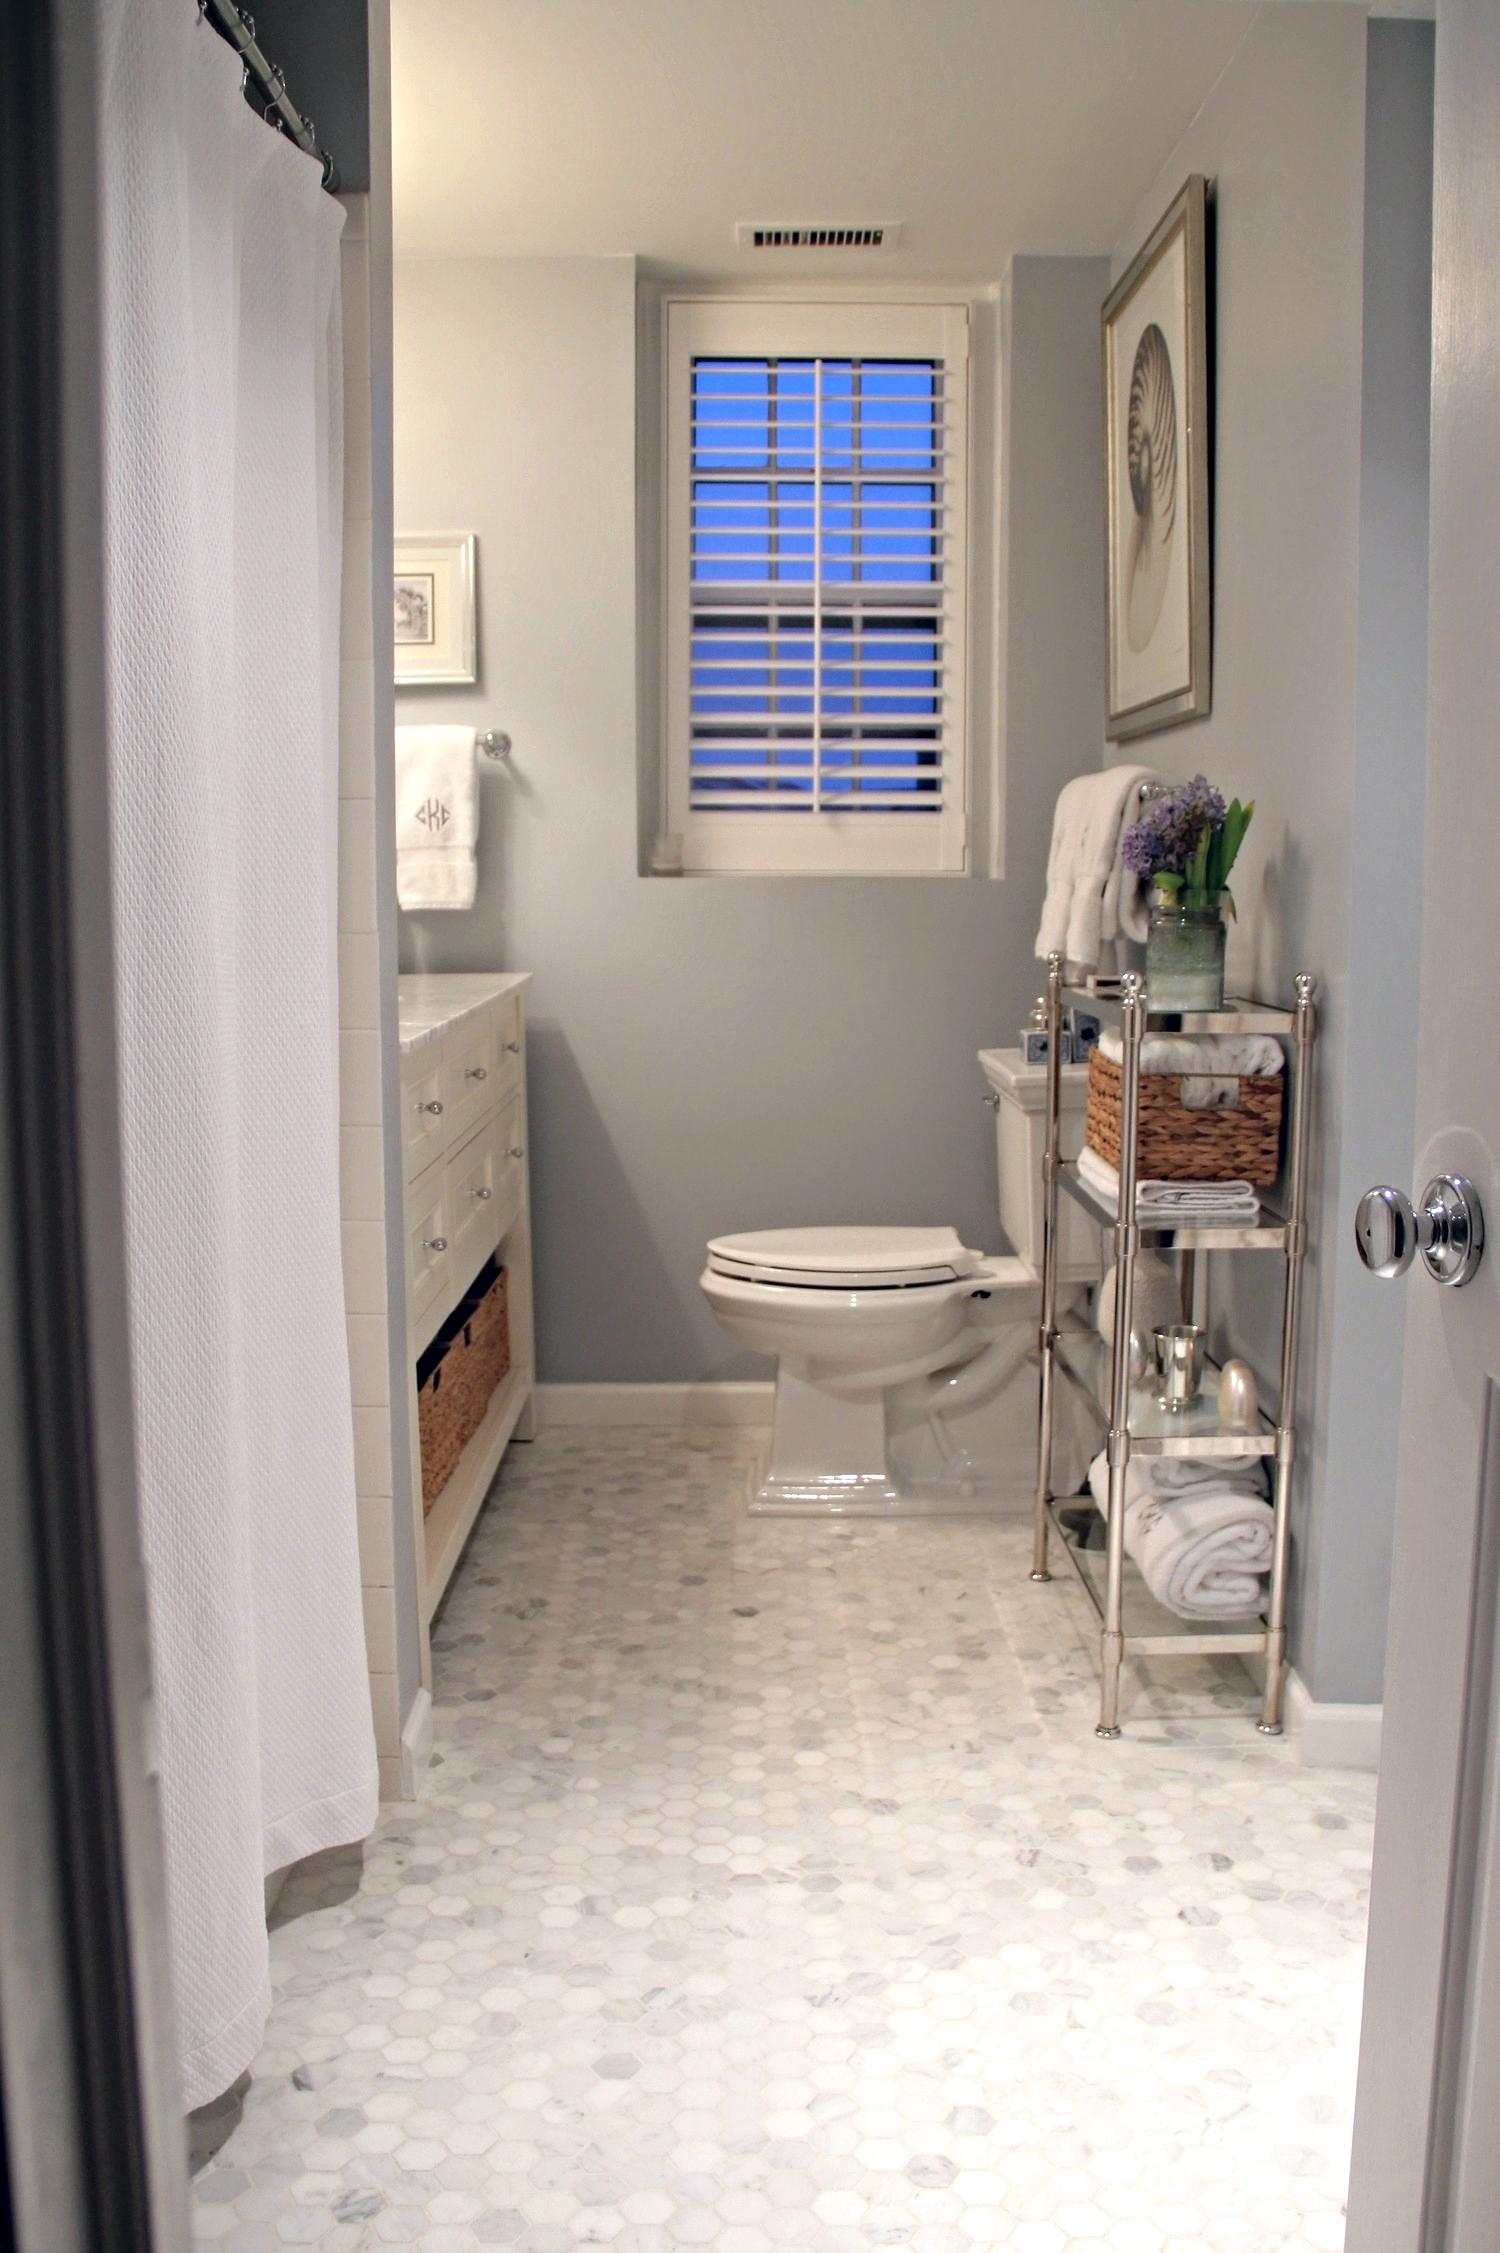 Bathroom no Bath Mat.jpg